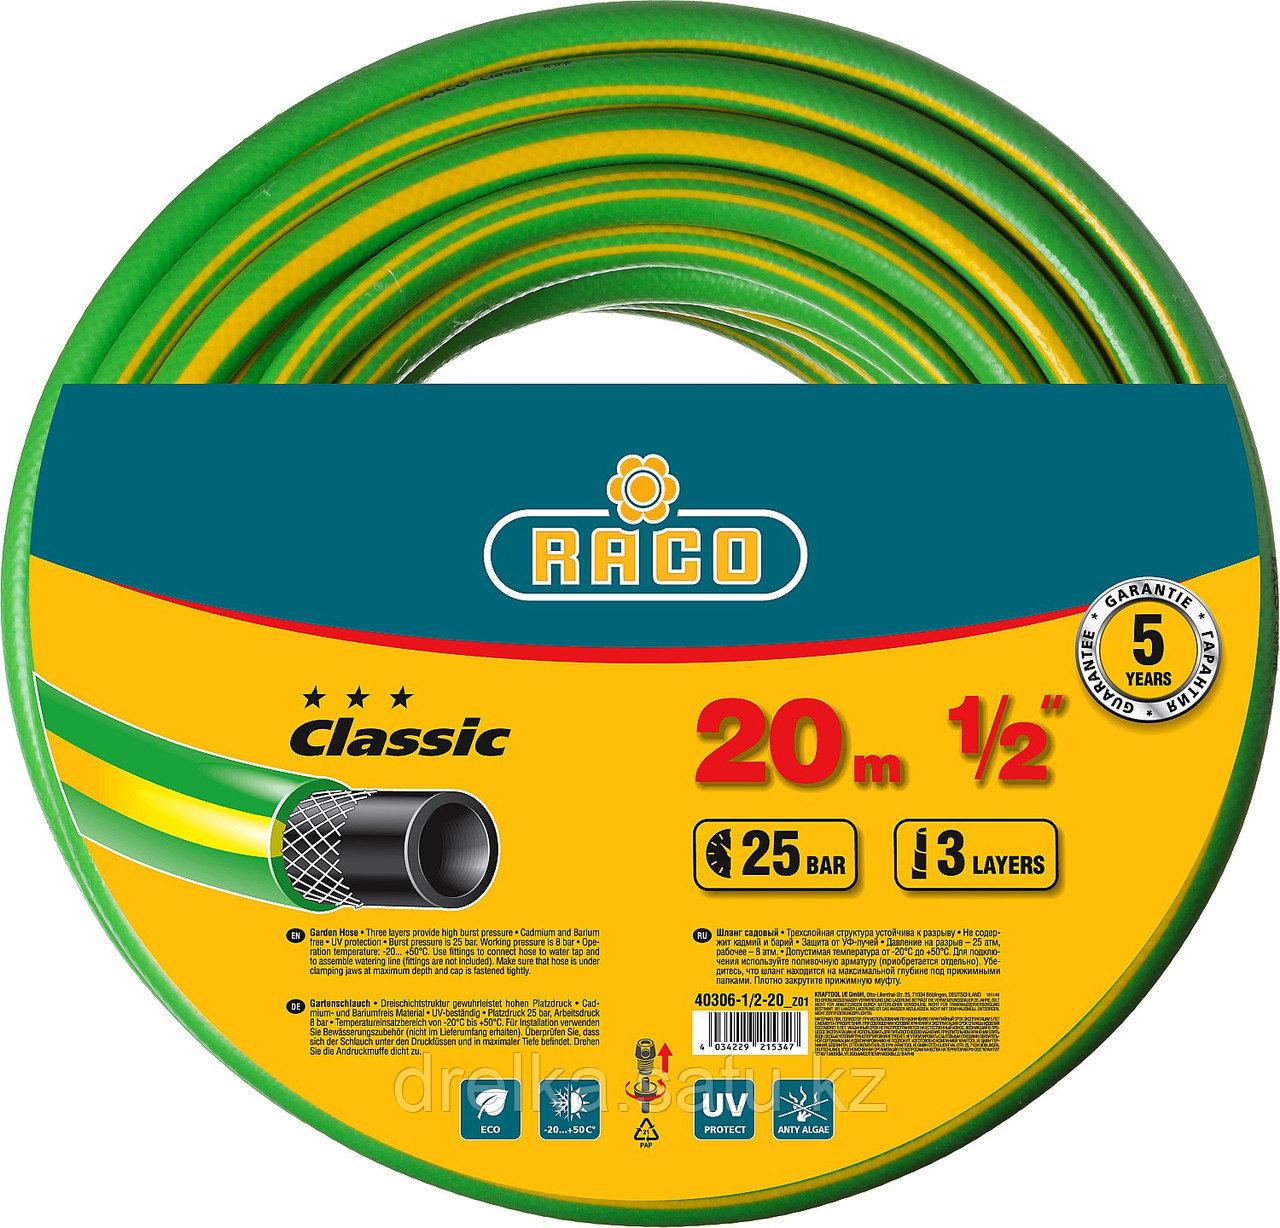 "Шланг для полива армированный RACO 40306-1/2-20_z01, CLASSIC, 25 атм., 3-х слойный, 1/2"" х 20 м"